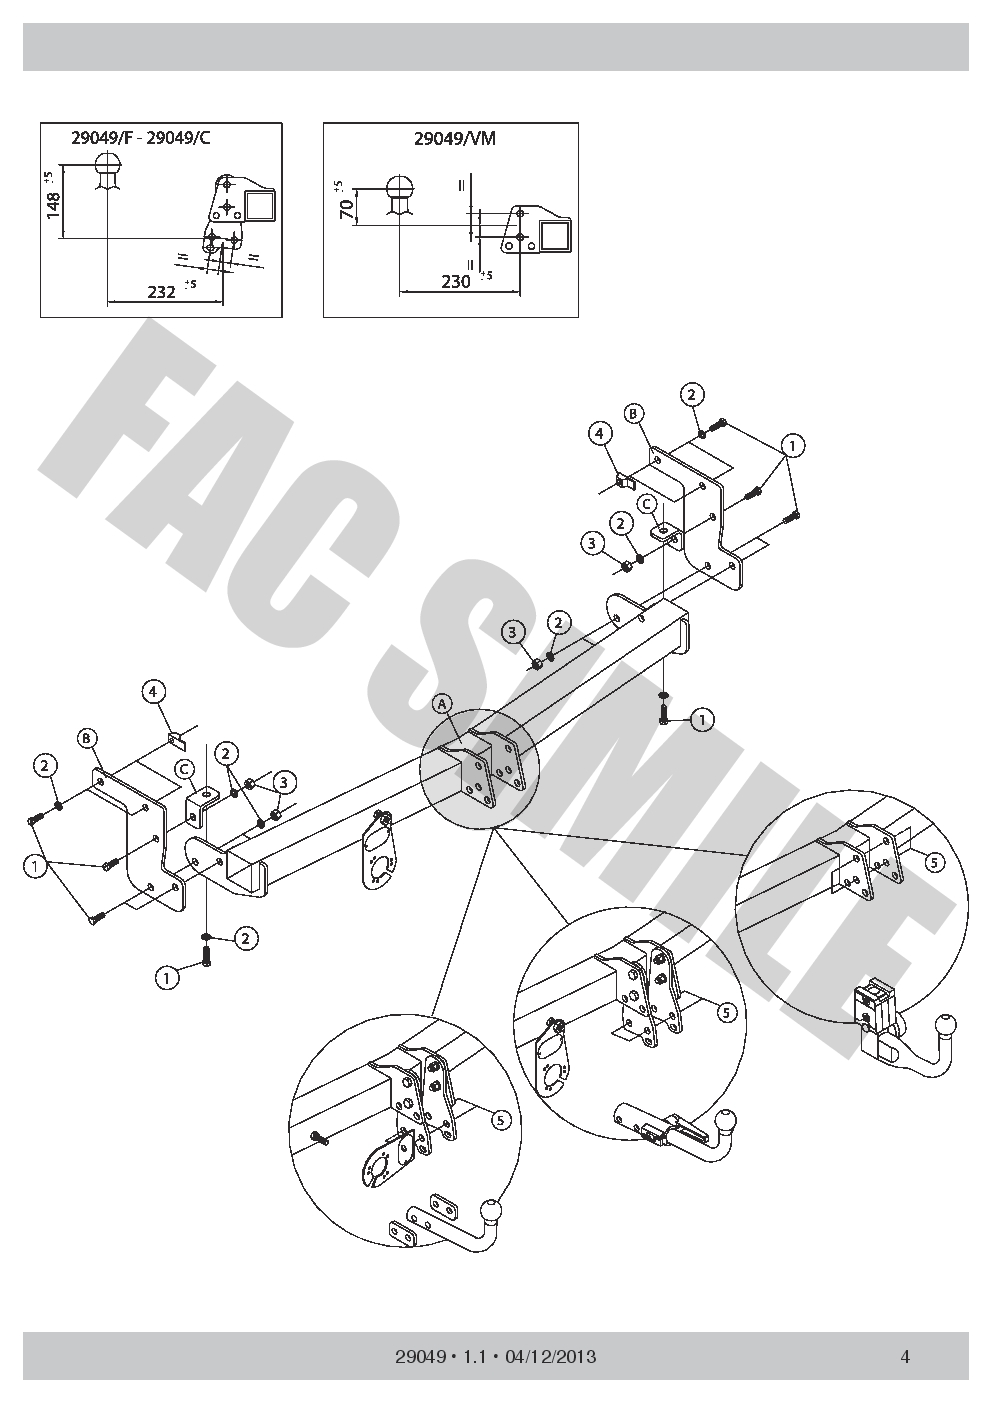 AHK Abnehmbare Anhängerkupplung Peugeot 08 SUV 13 29049/_E1